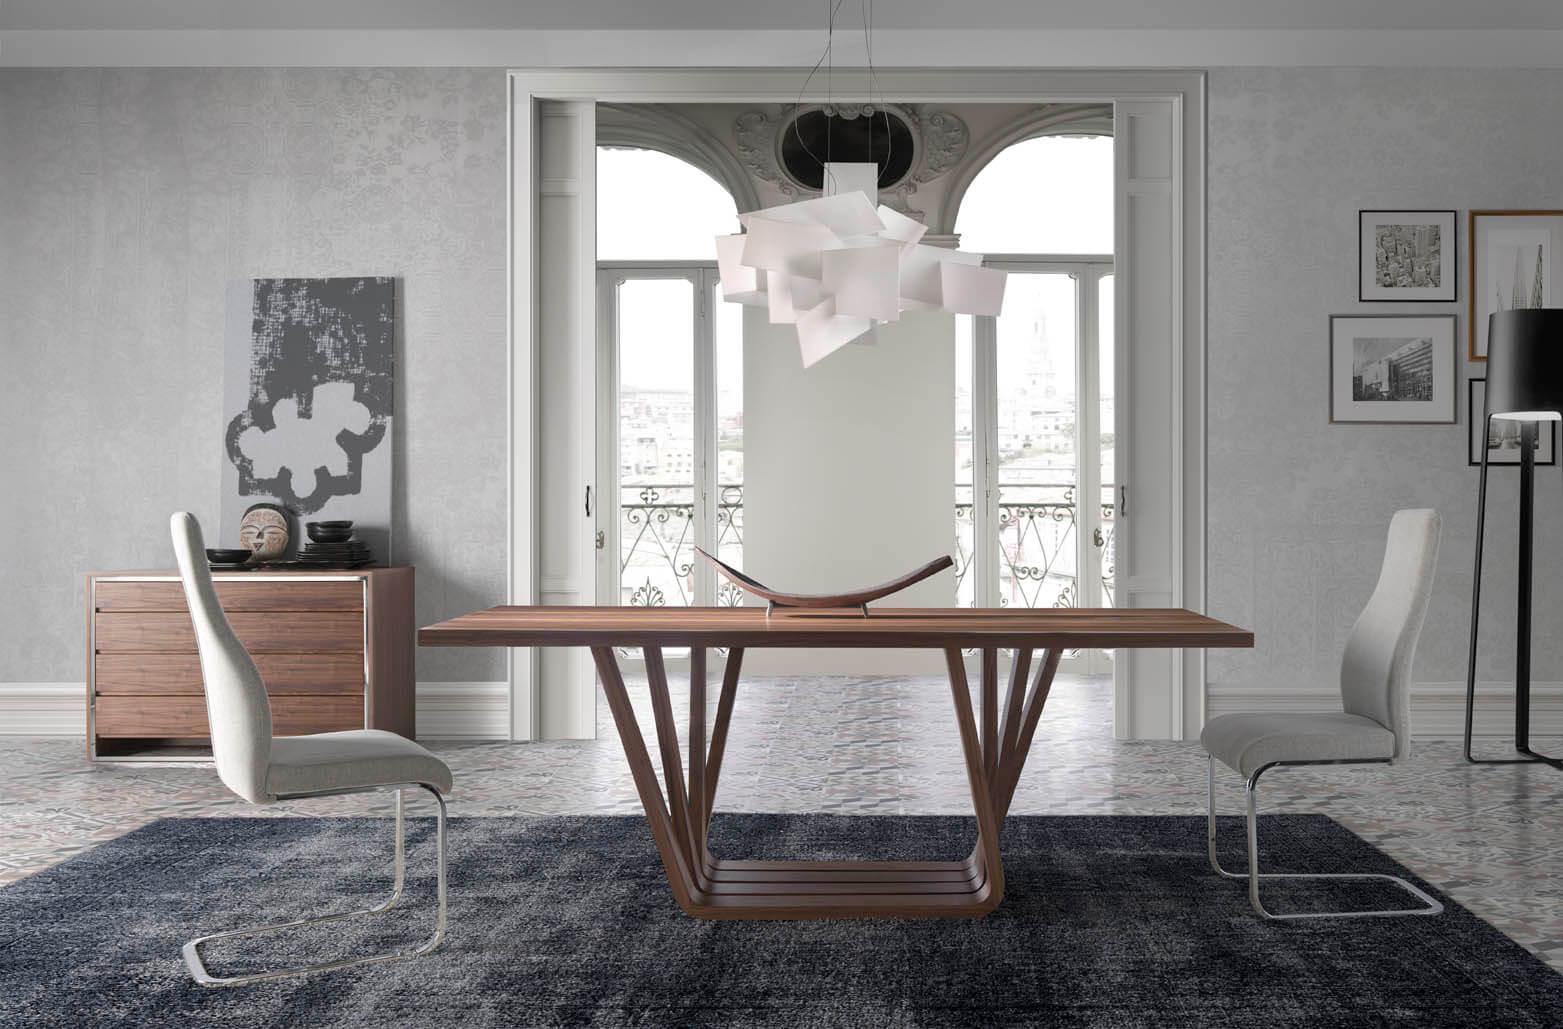 Muebles Cocina Dise O Italiano Azarak Com Ideas Interesantes  # Muebles Vanguardia